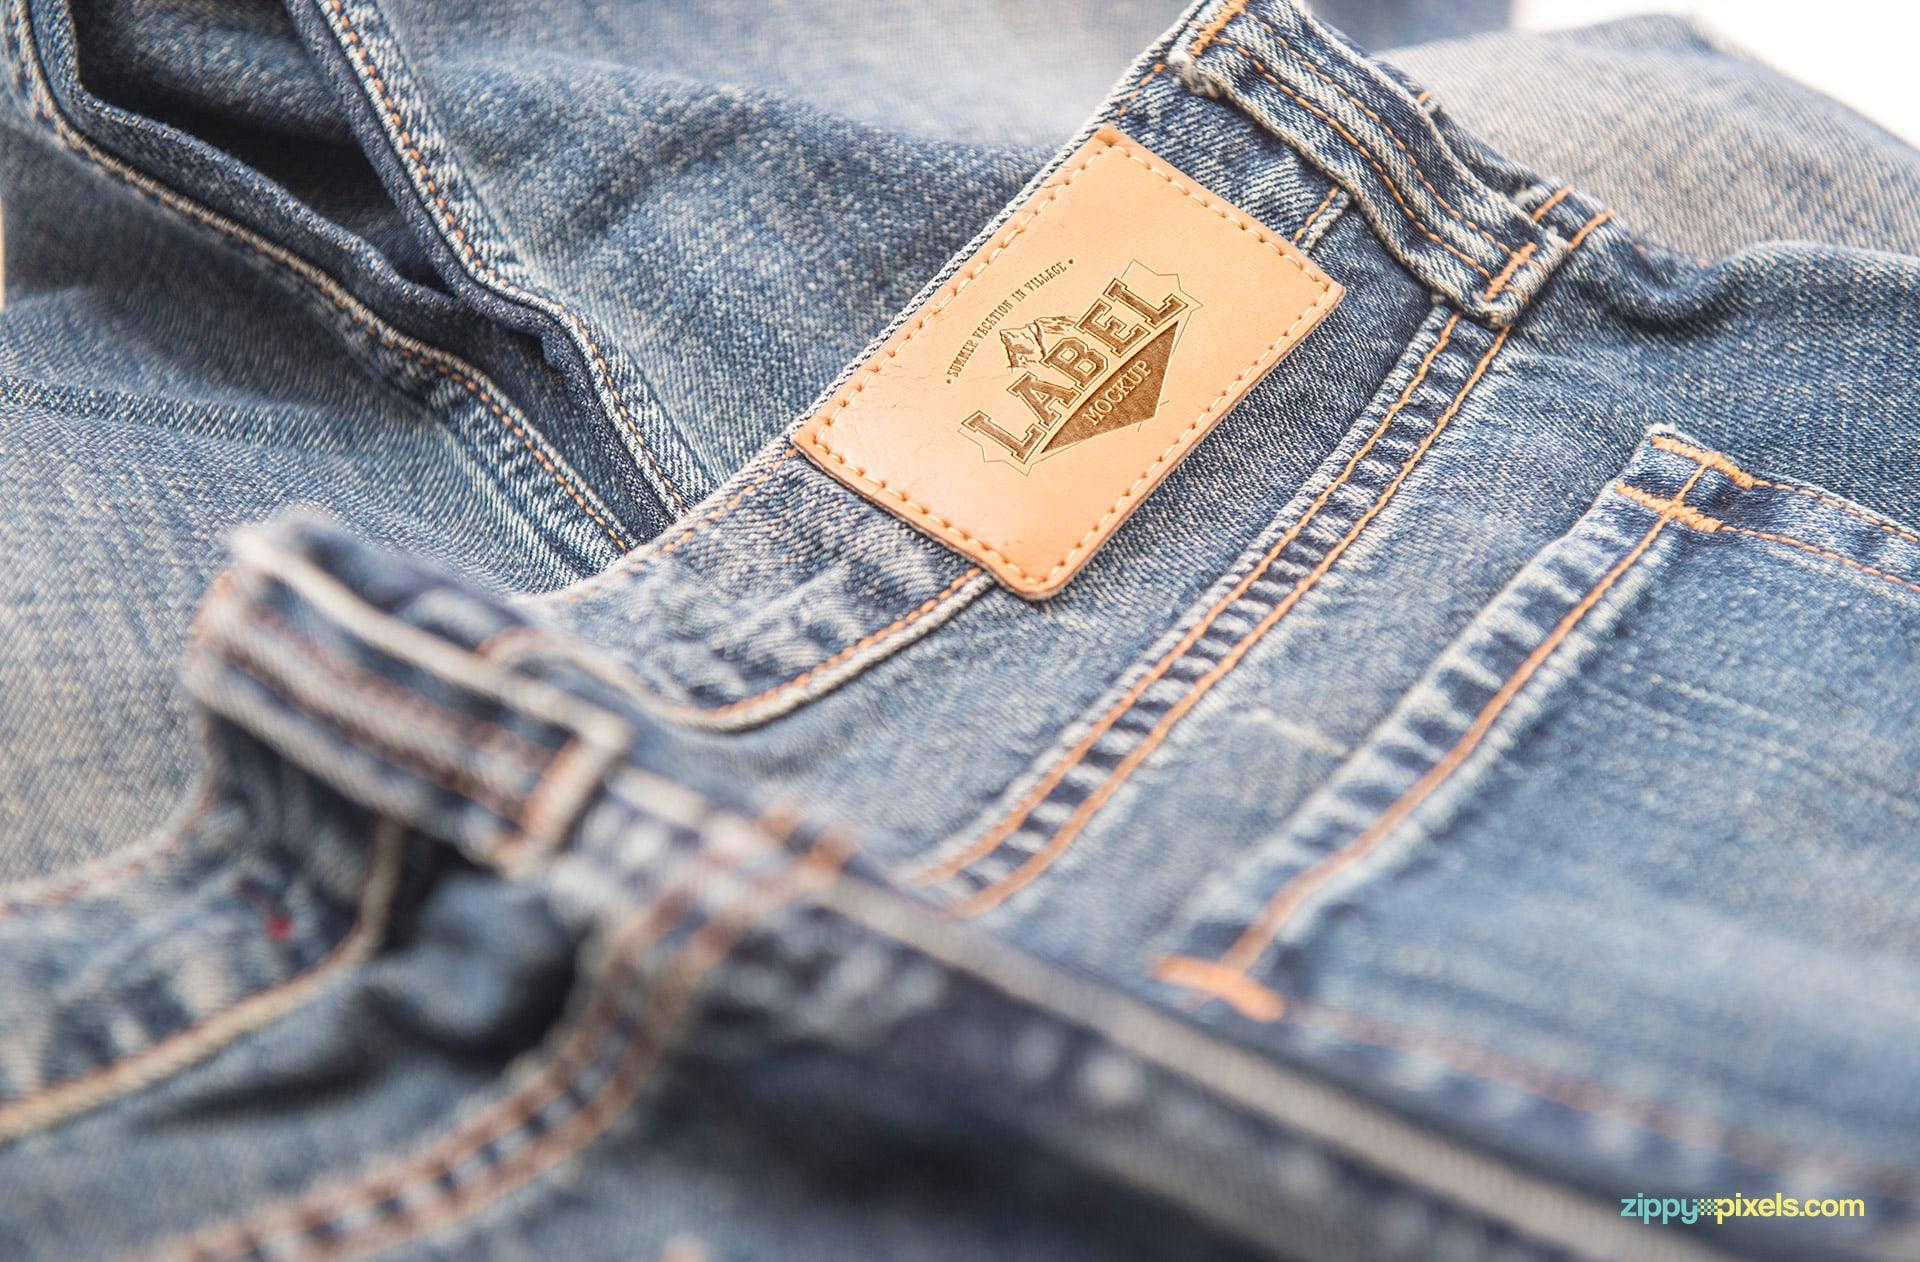 02-jeans-label-mockup-824x542